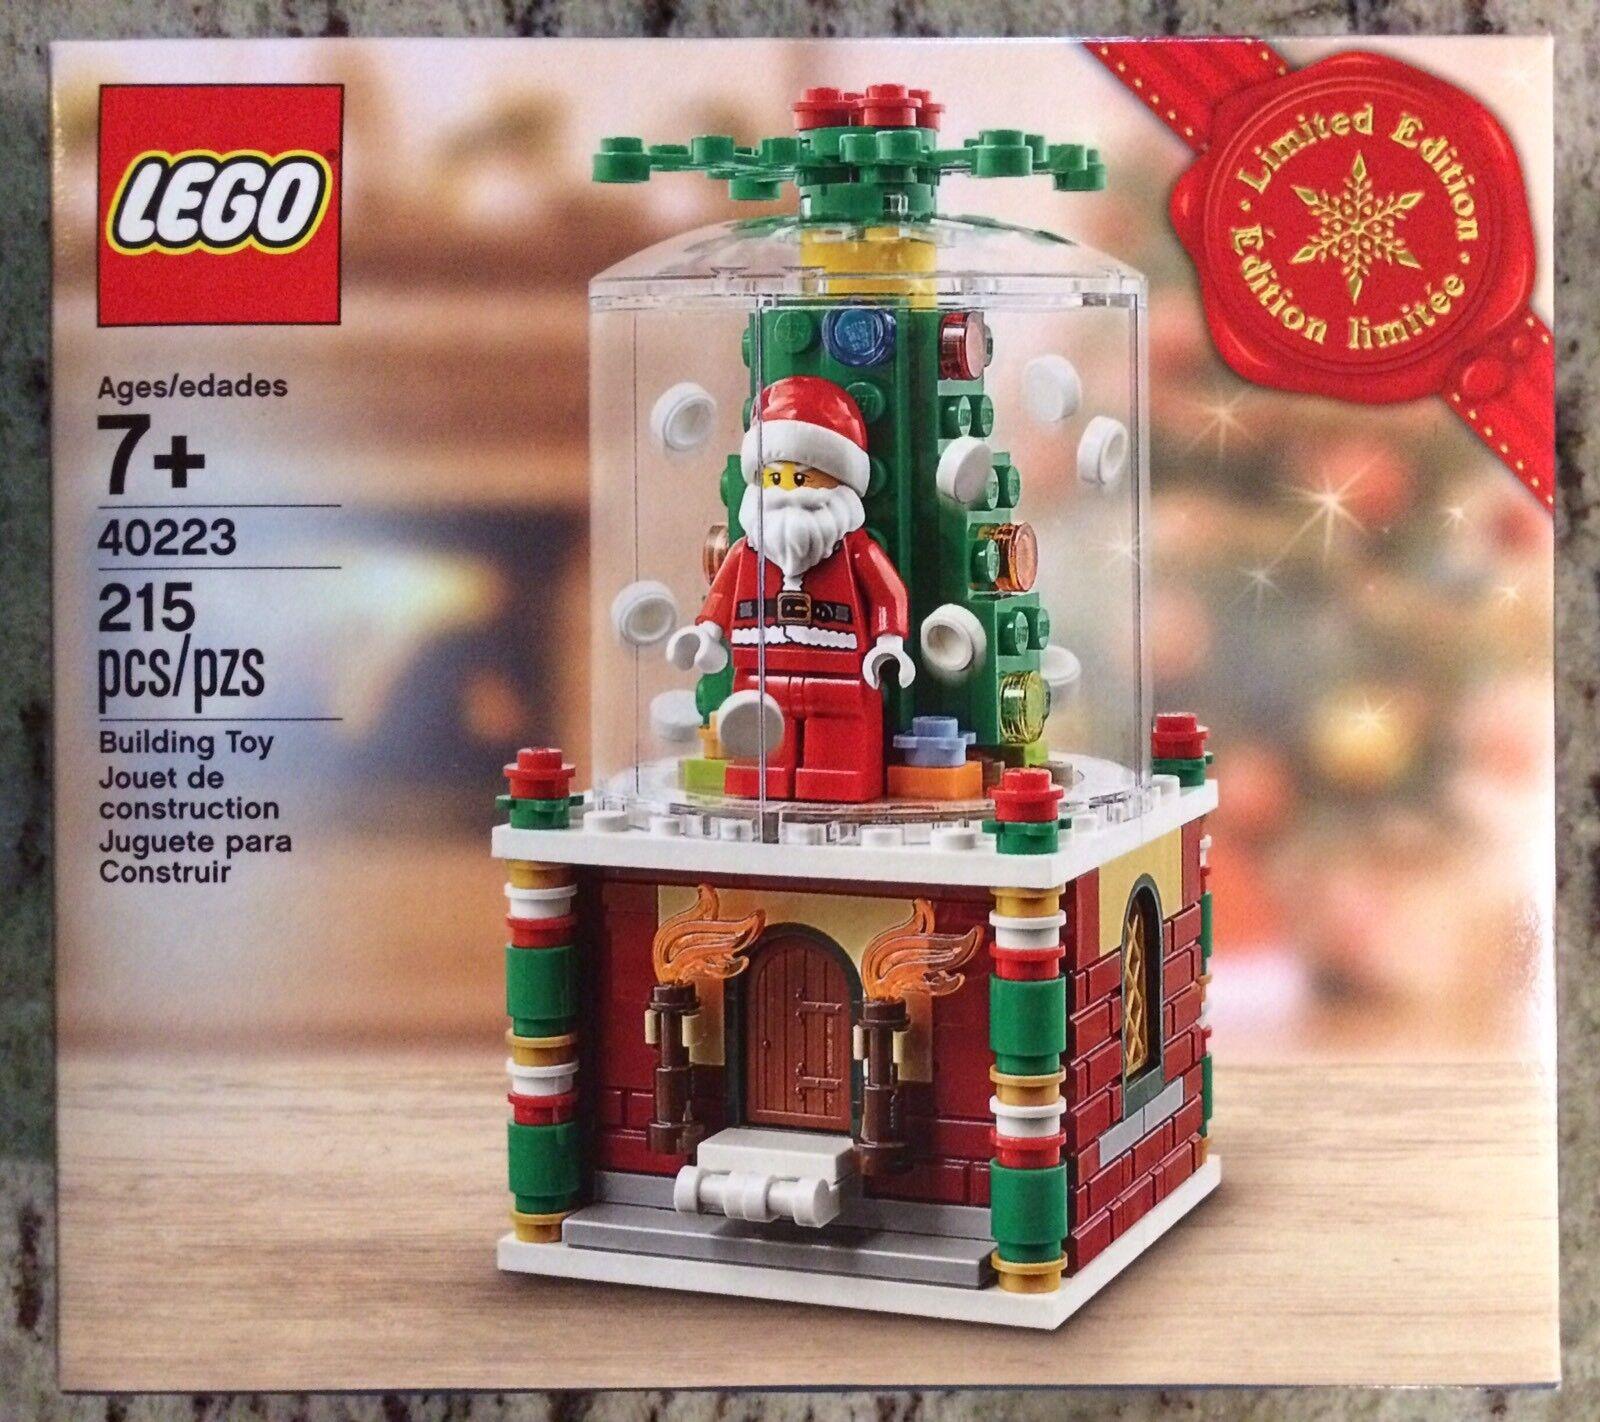 Lego 40223 Christmas Santa Snow Globe 2016 Limited Edition Set New In Sealed Box